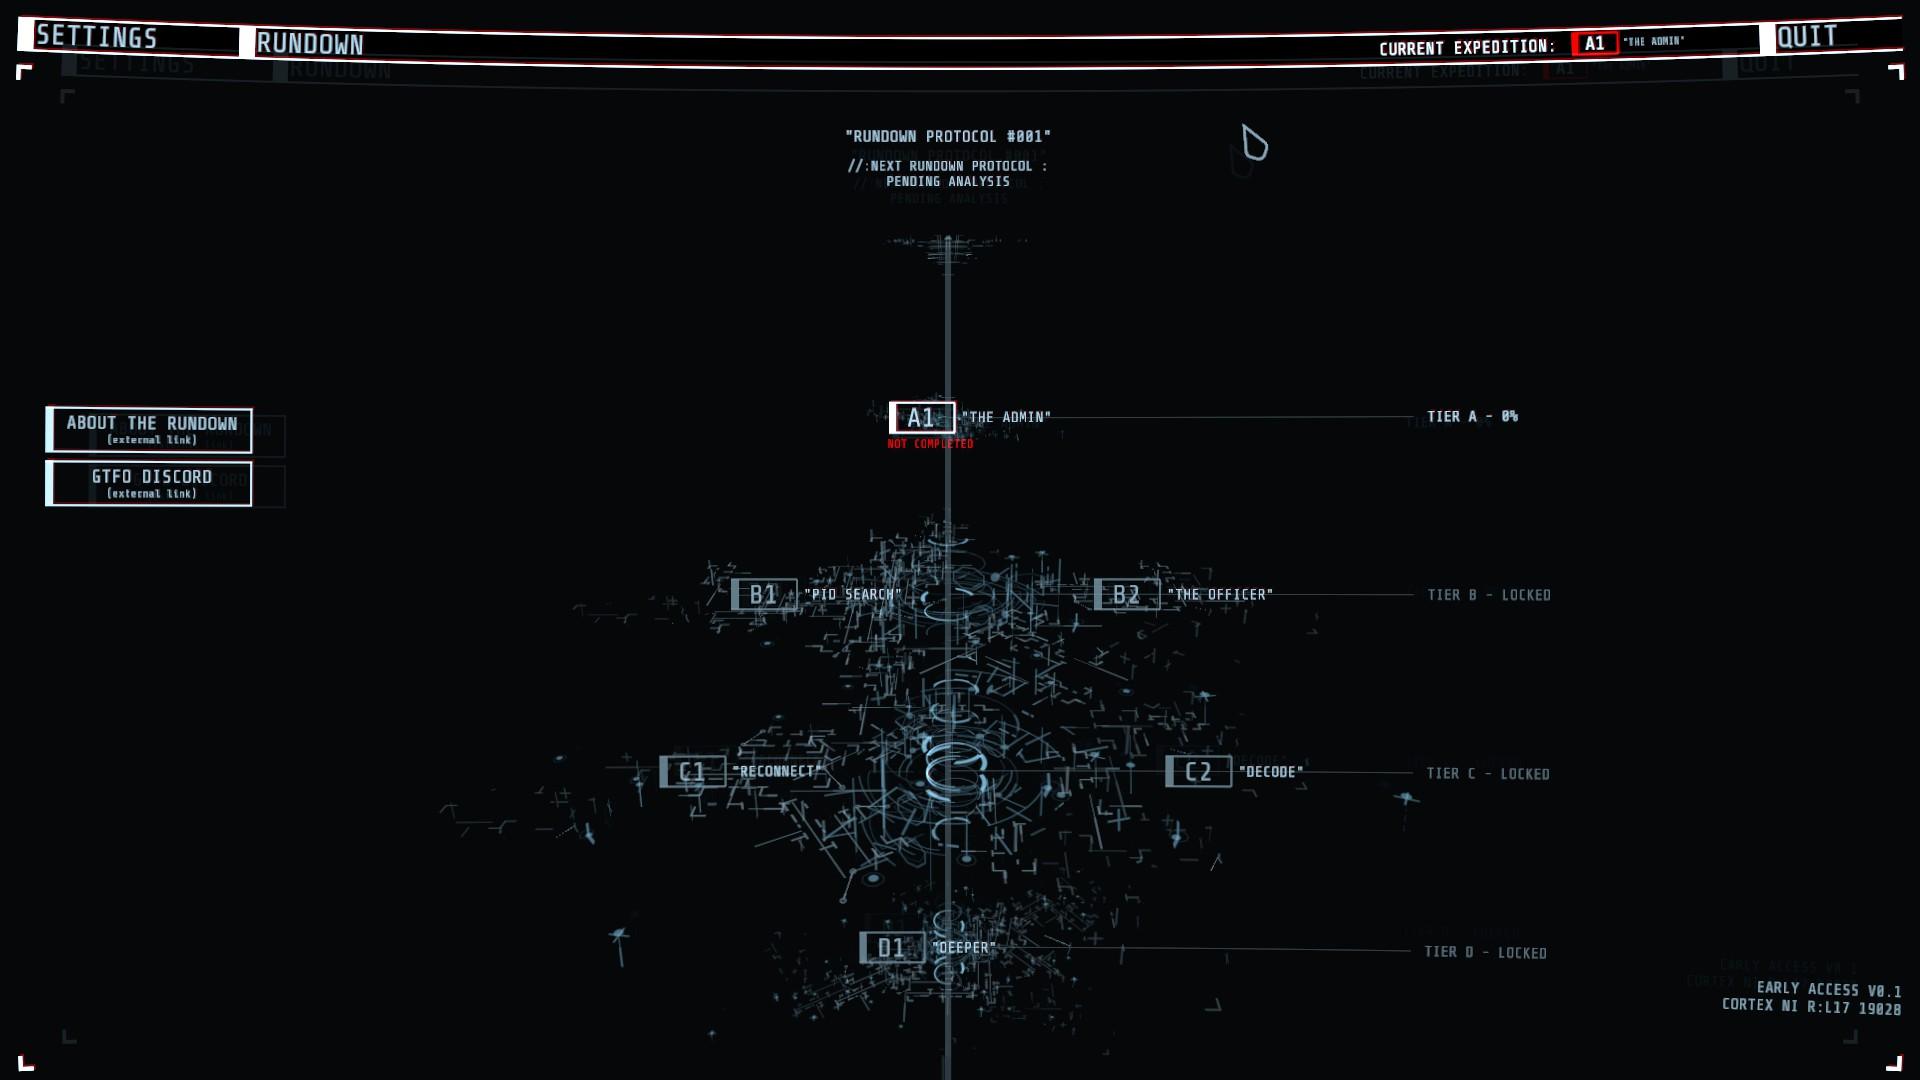 [PCゲーム]GTFO早期アクセス、そうだ皆で地下施設を調べにいこう。6